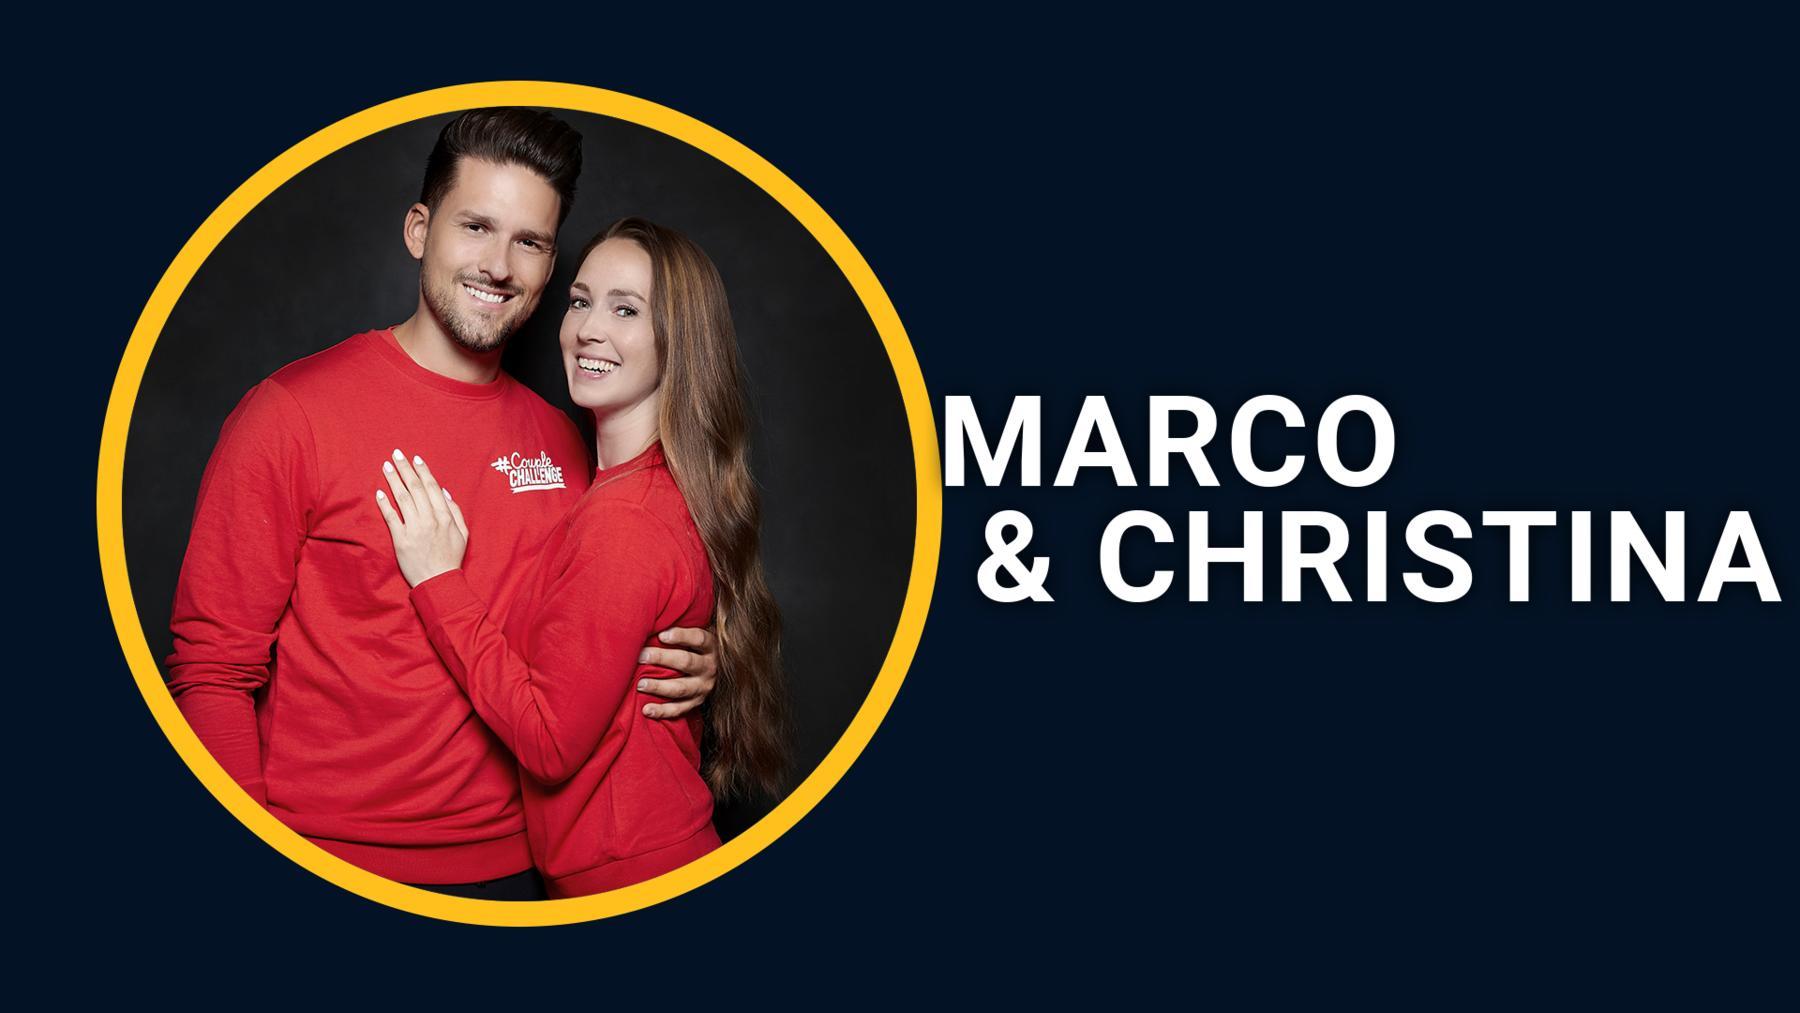 Marco & Christina